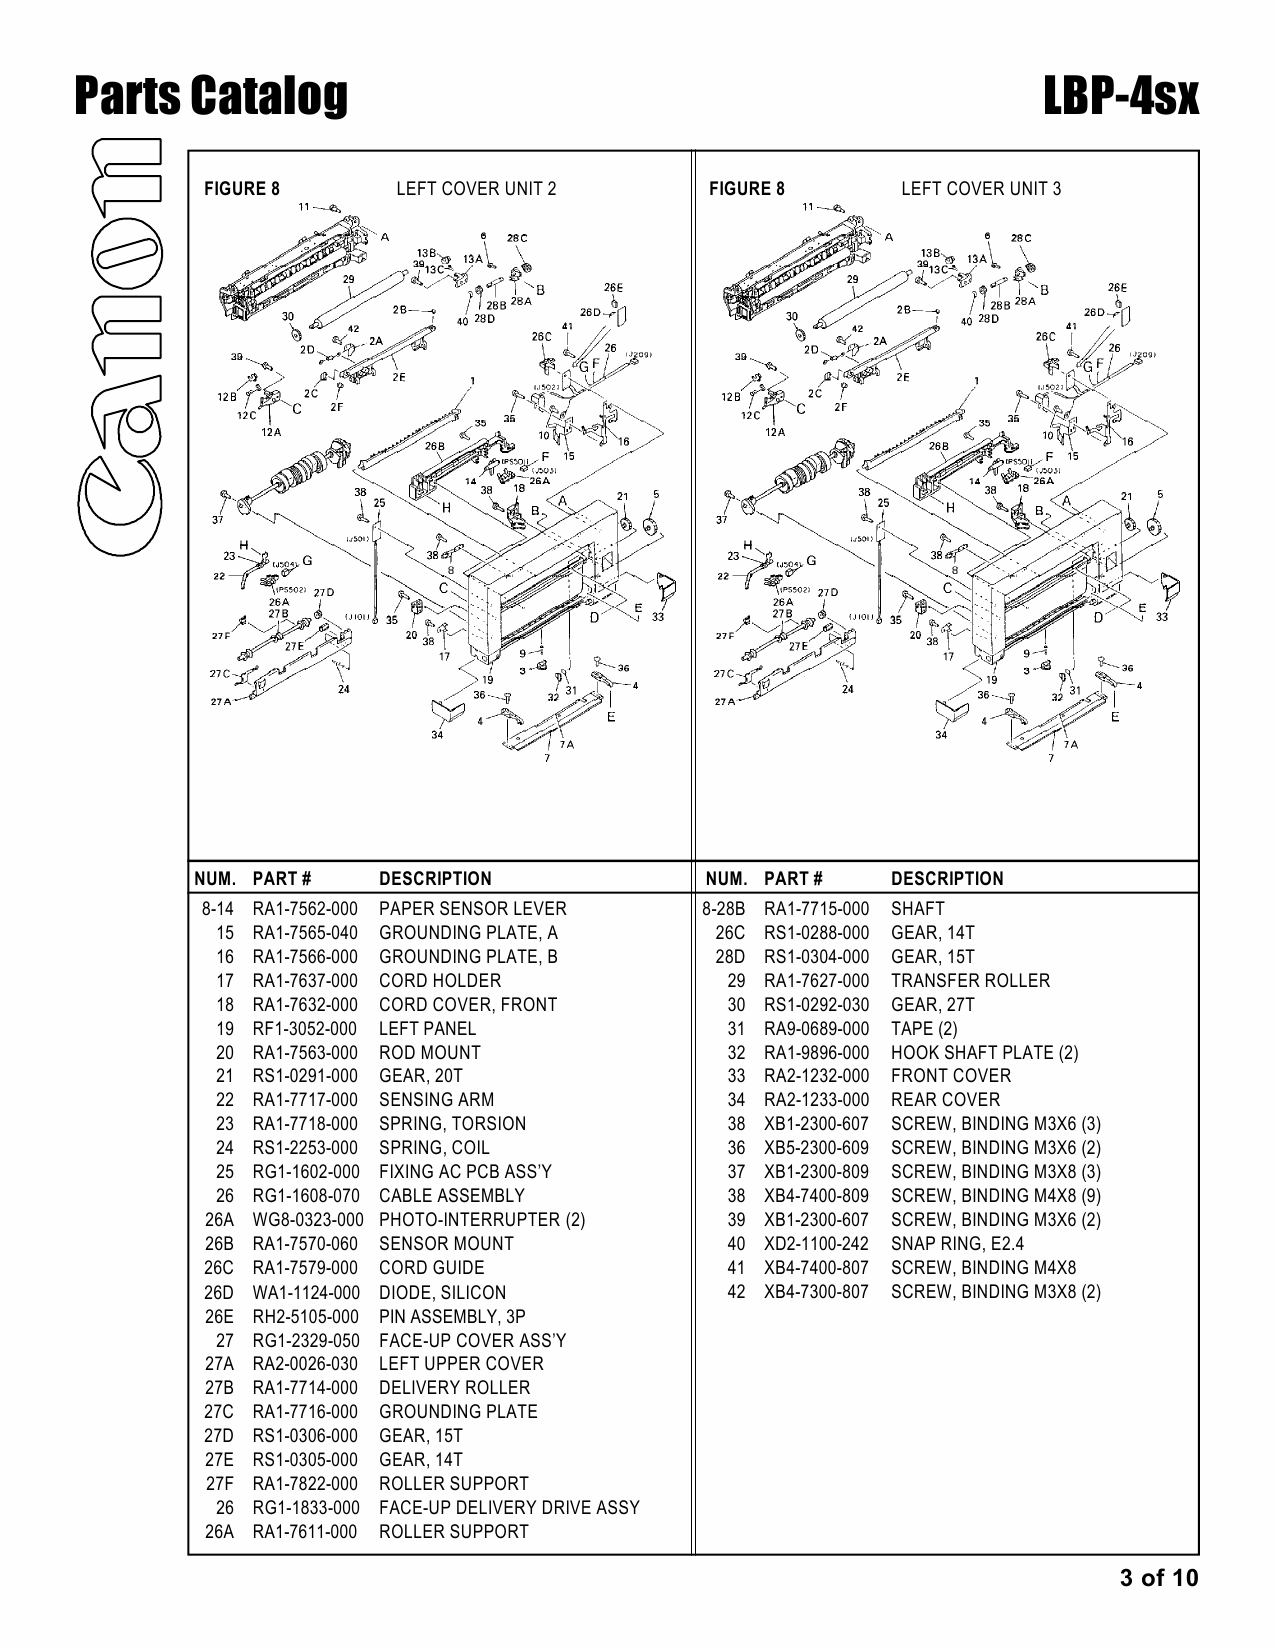 roland rd-700 sx manual pdf